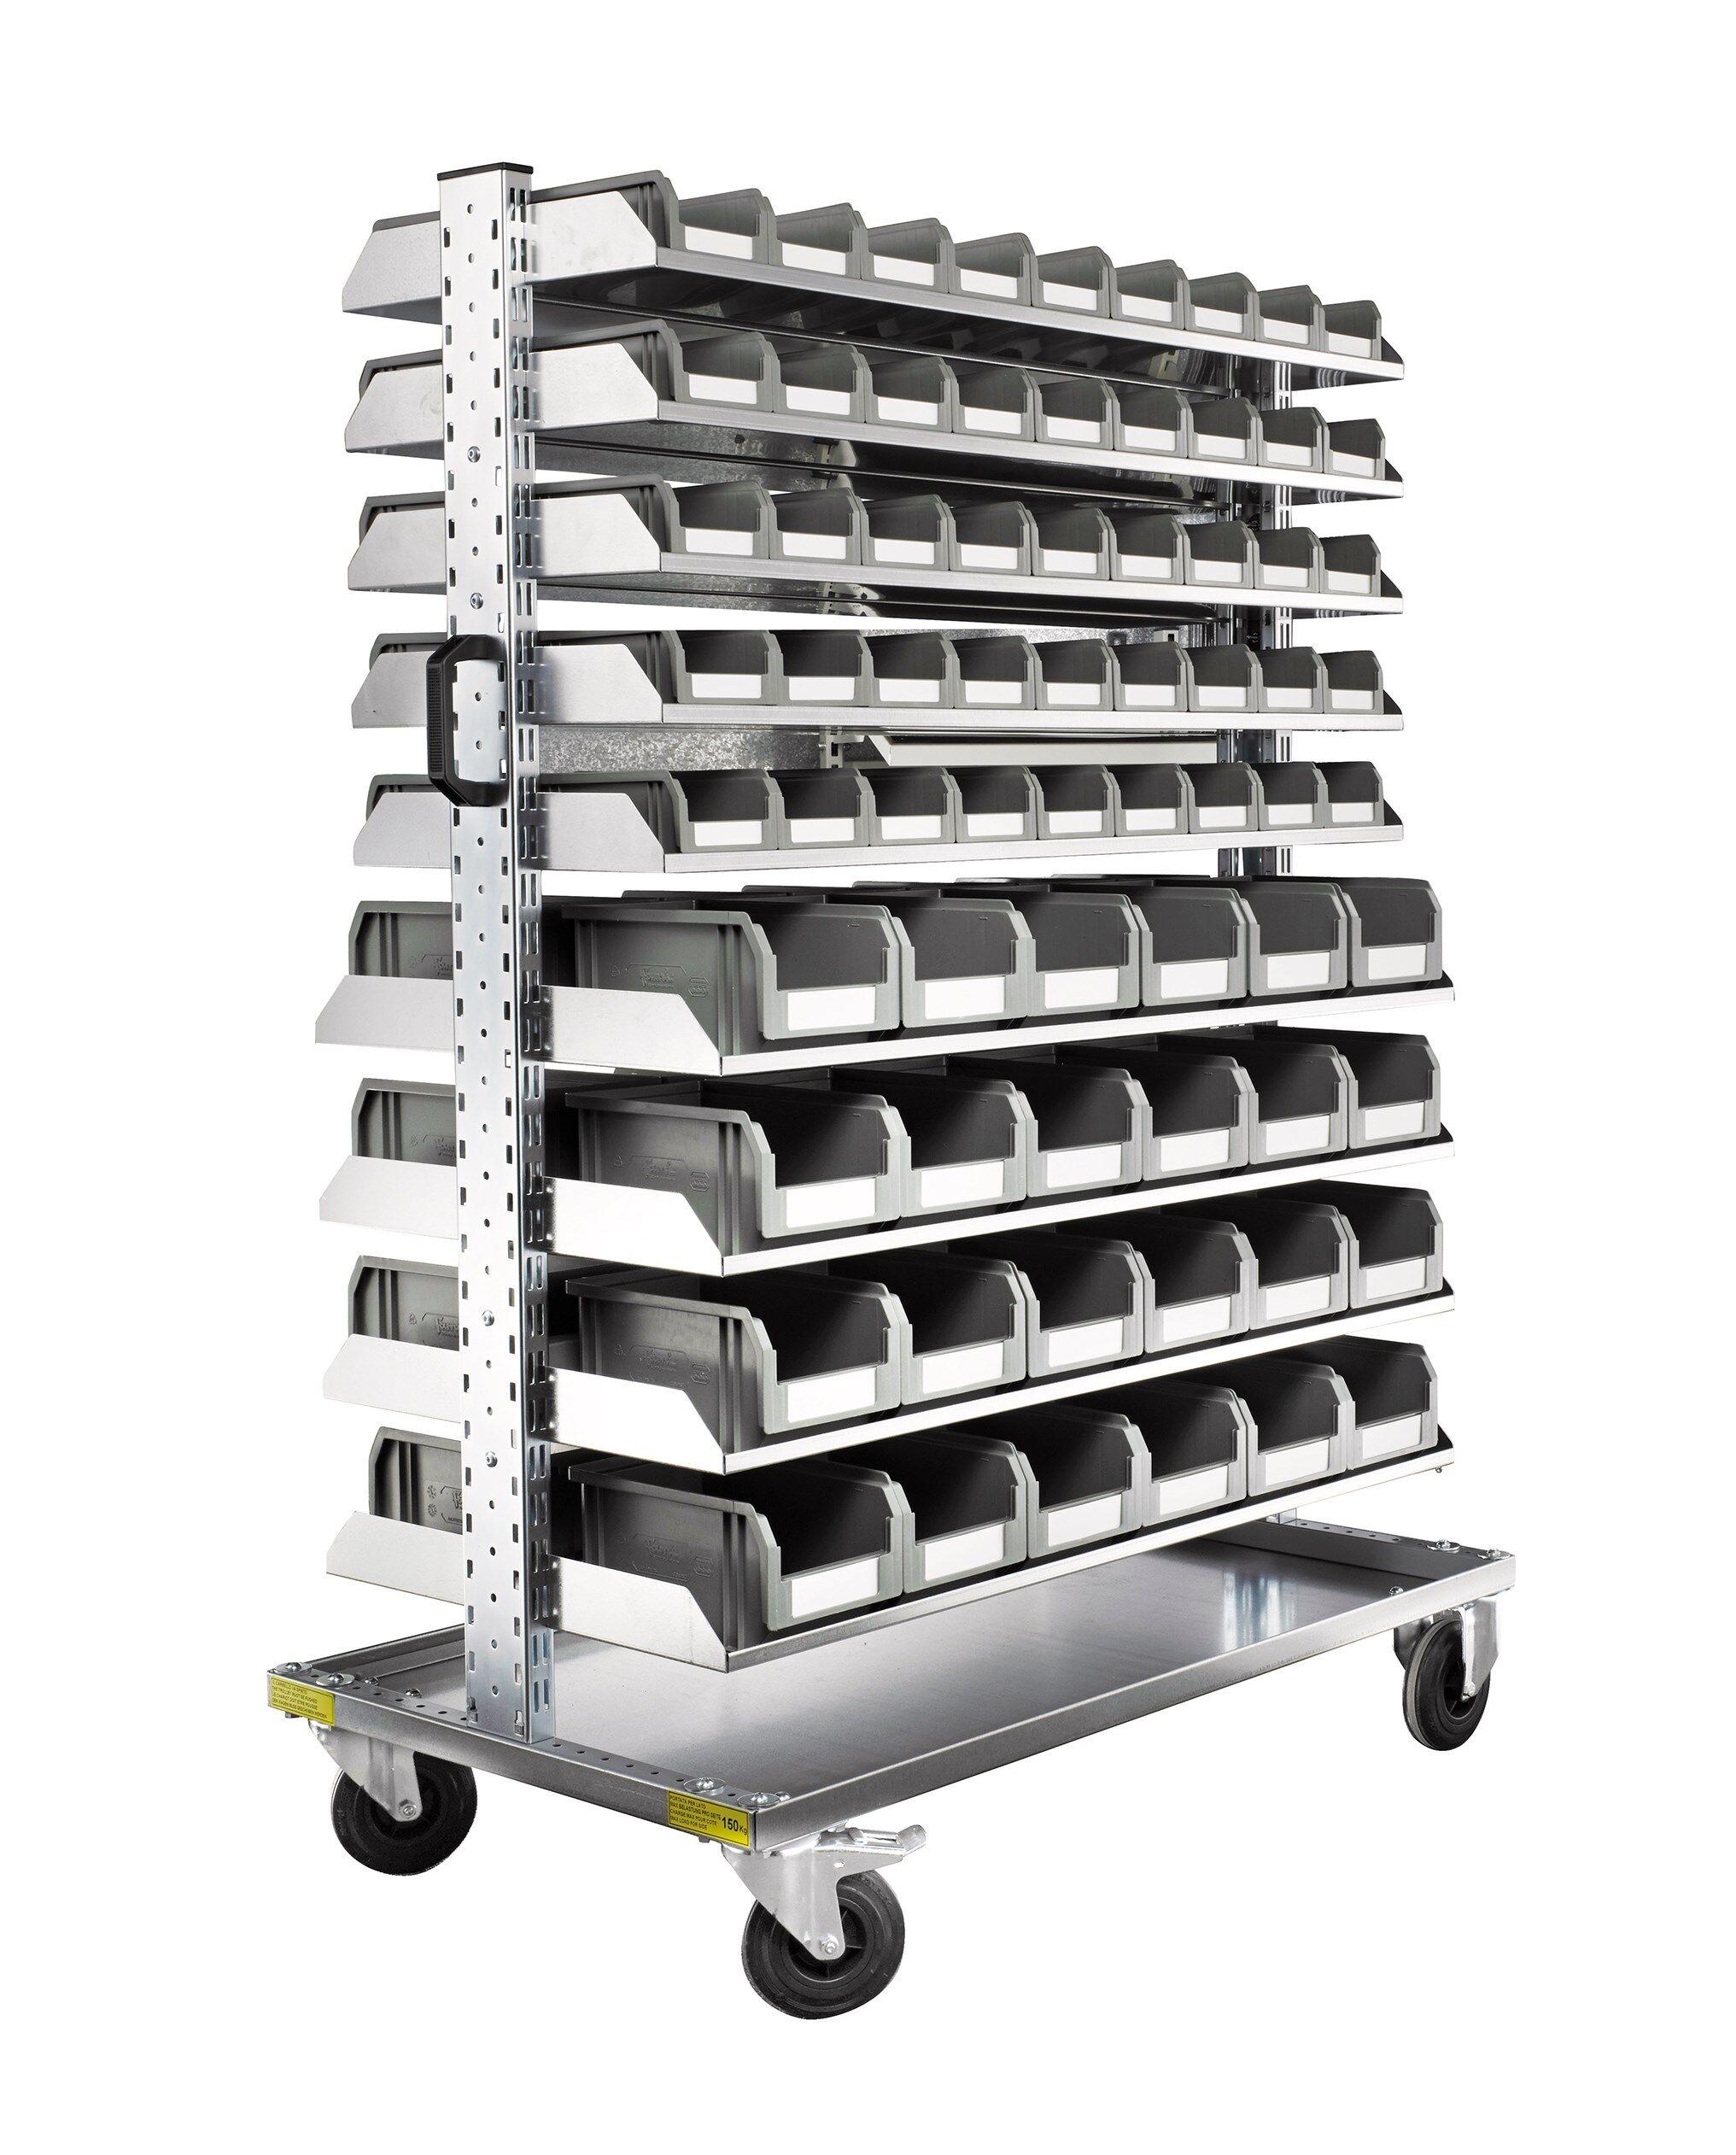 SETAM Chariot mobile avec rack 138 bacs à bec plastiques